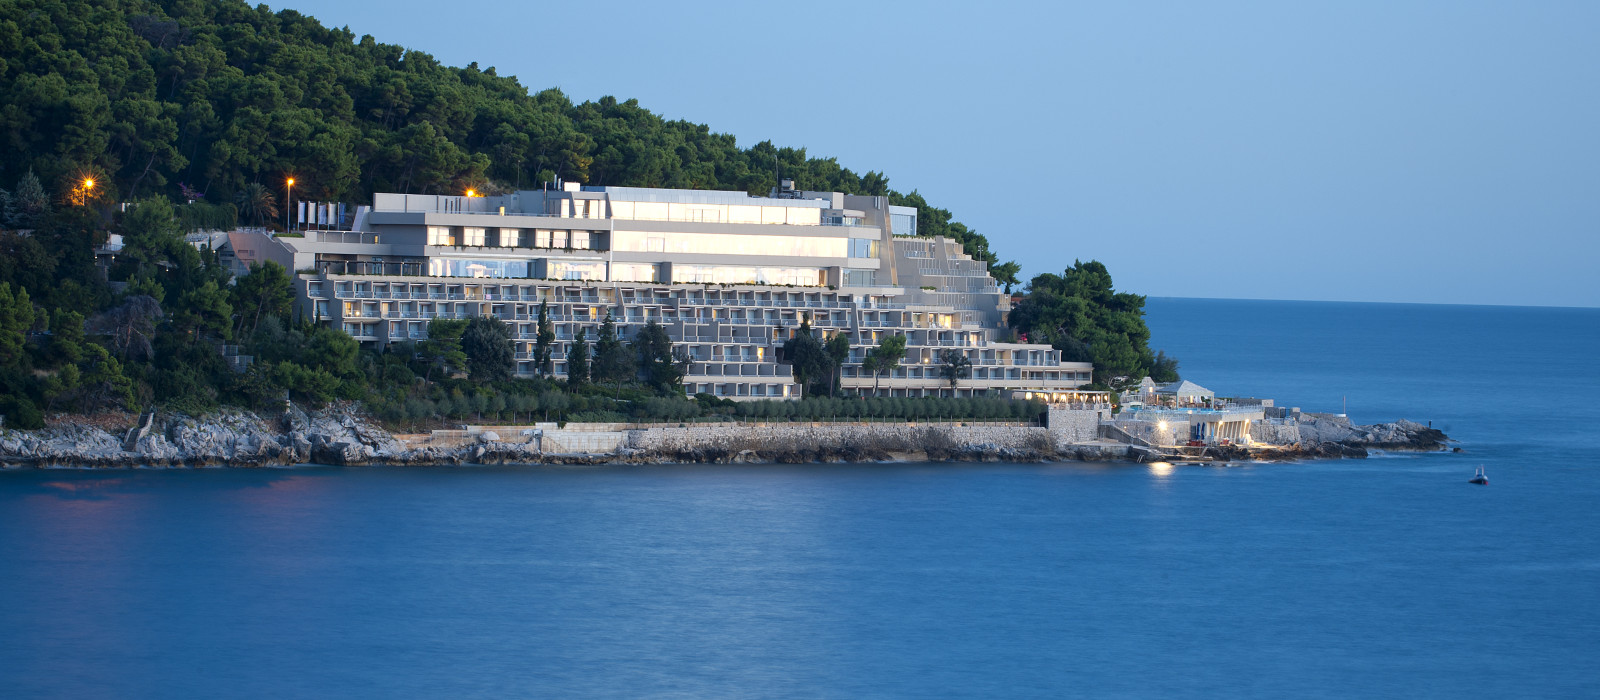 Hotel  Dubrovnik Palace Croatia & Slovenia